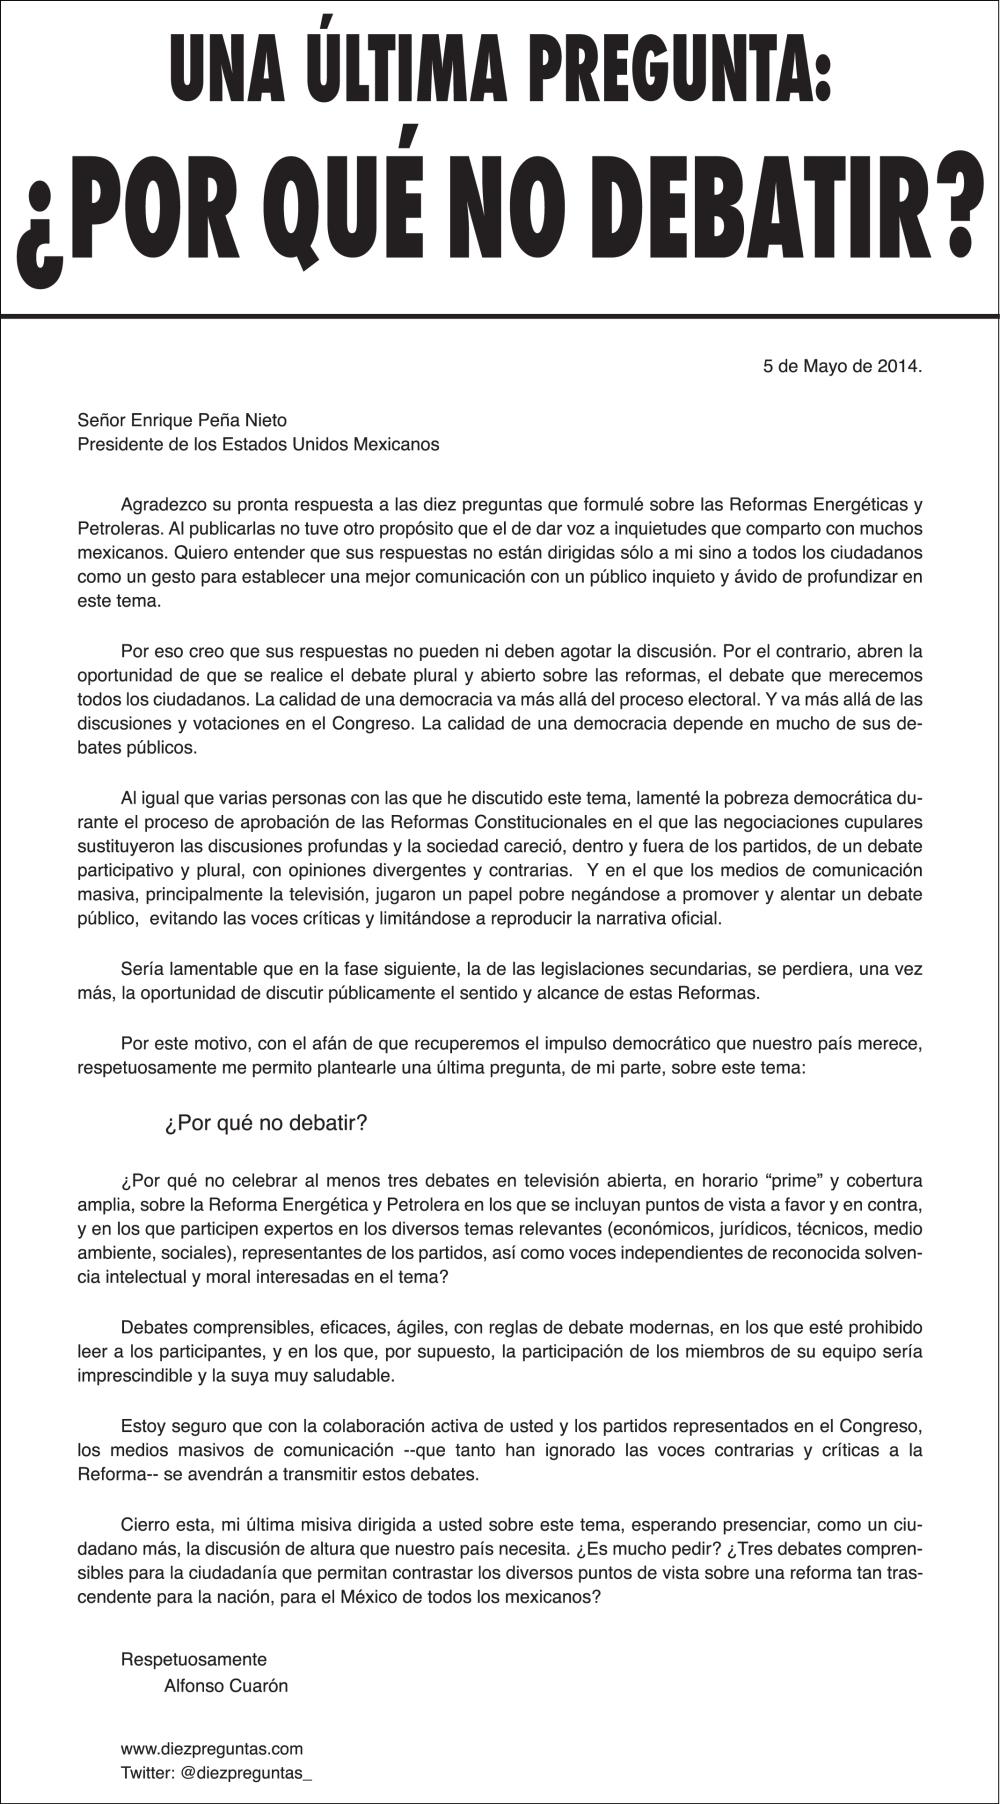 UltimaPregunta(4mayo14) (1) copy